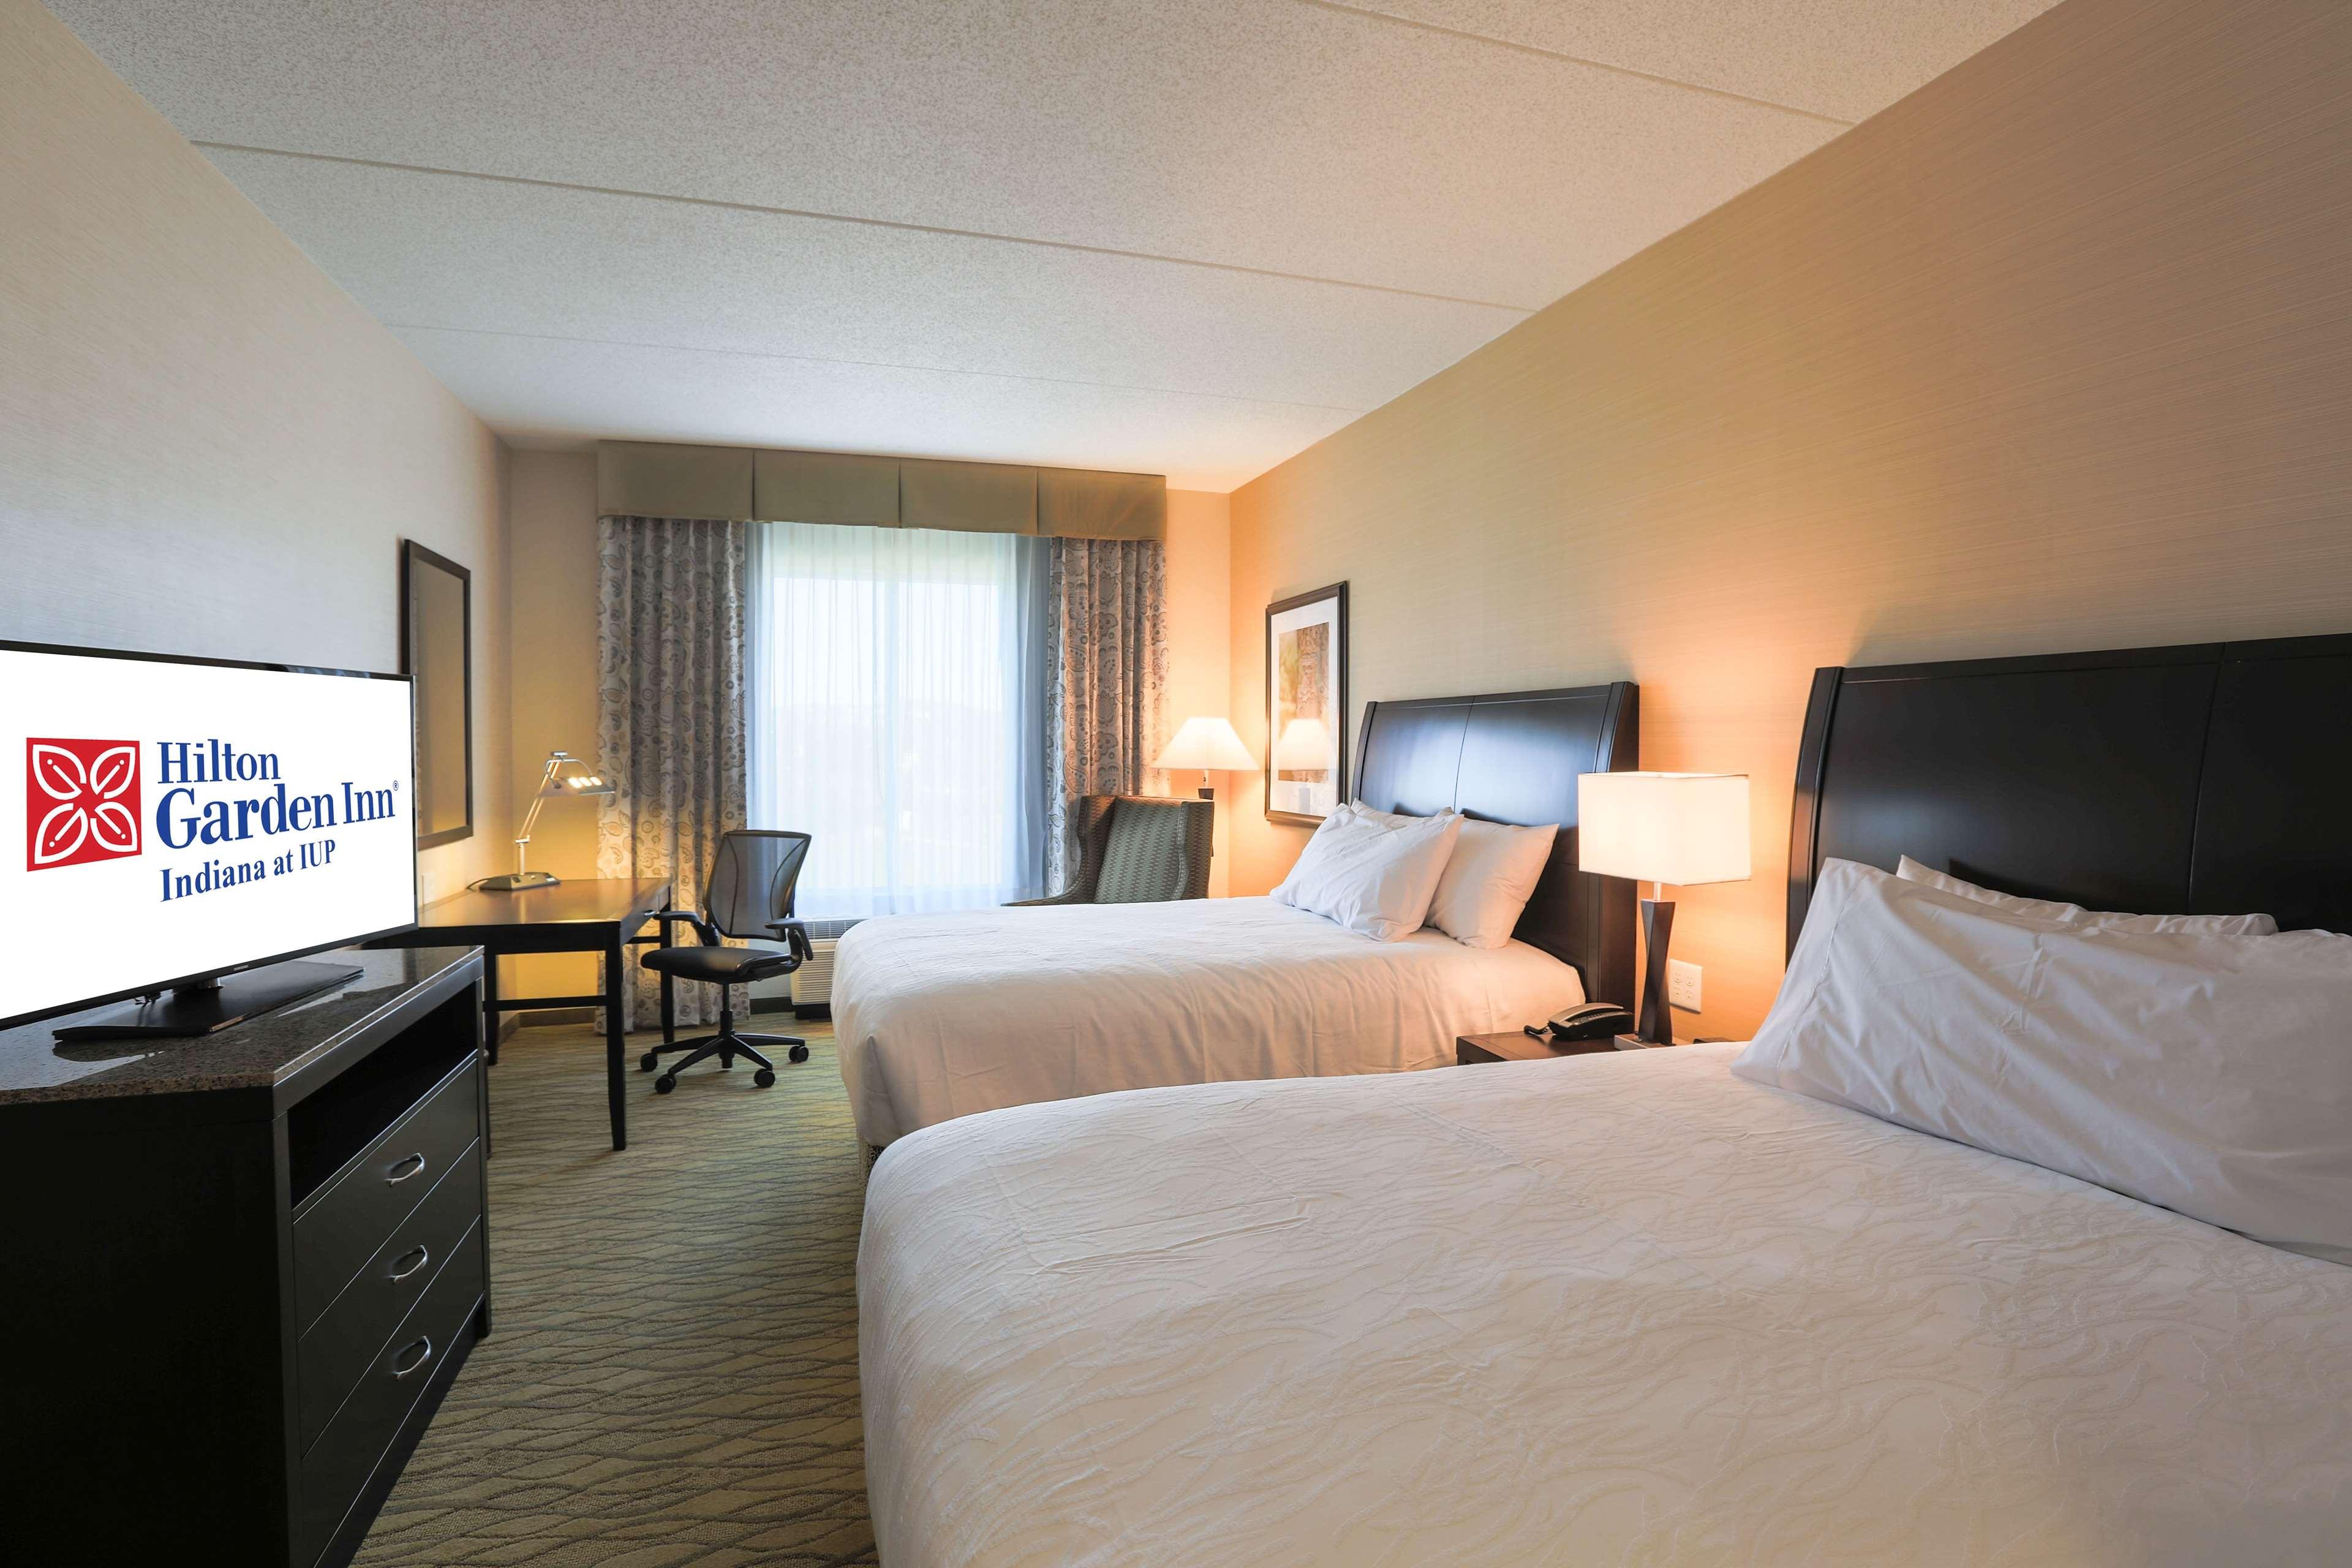 Hilton Garden Inn Indiana at IUP image 20